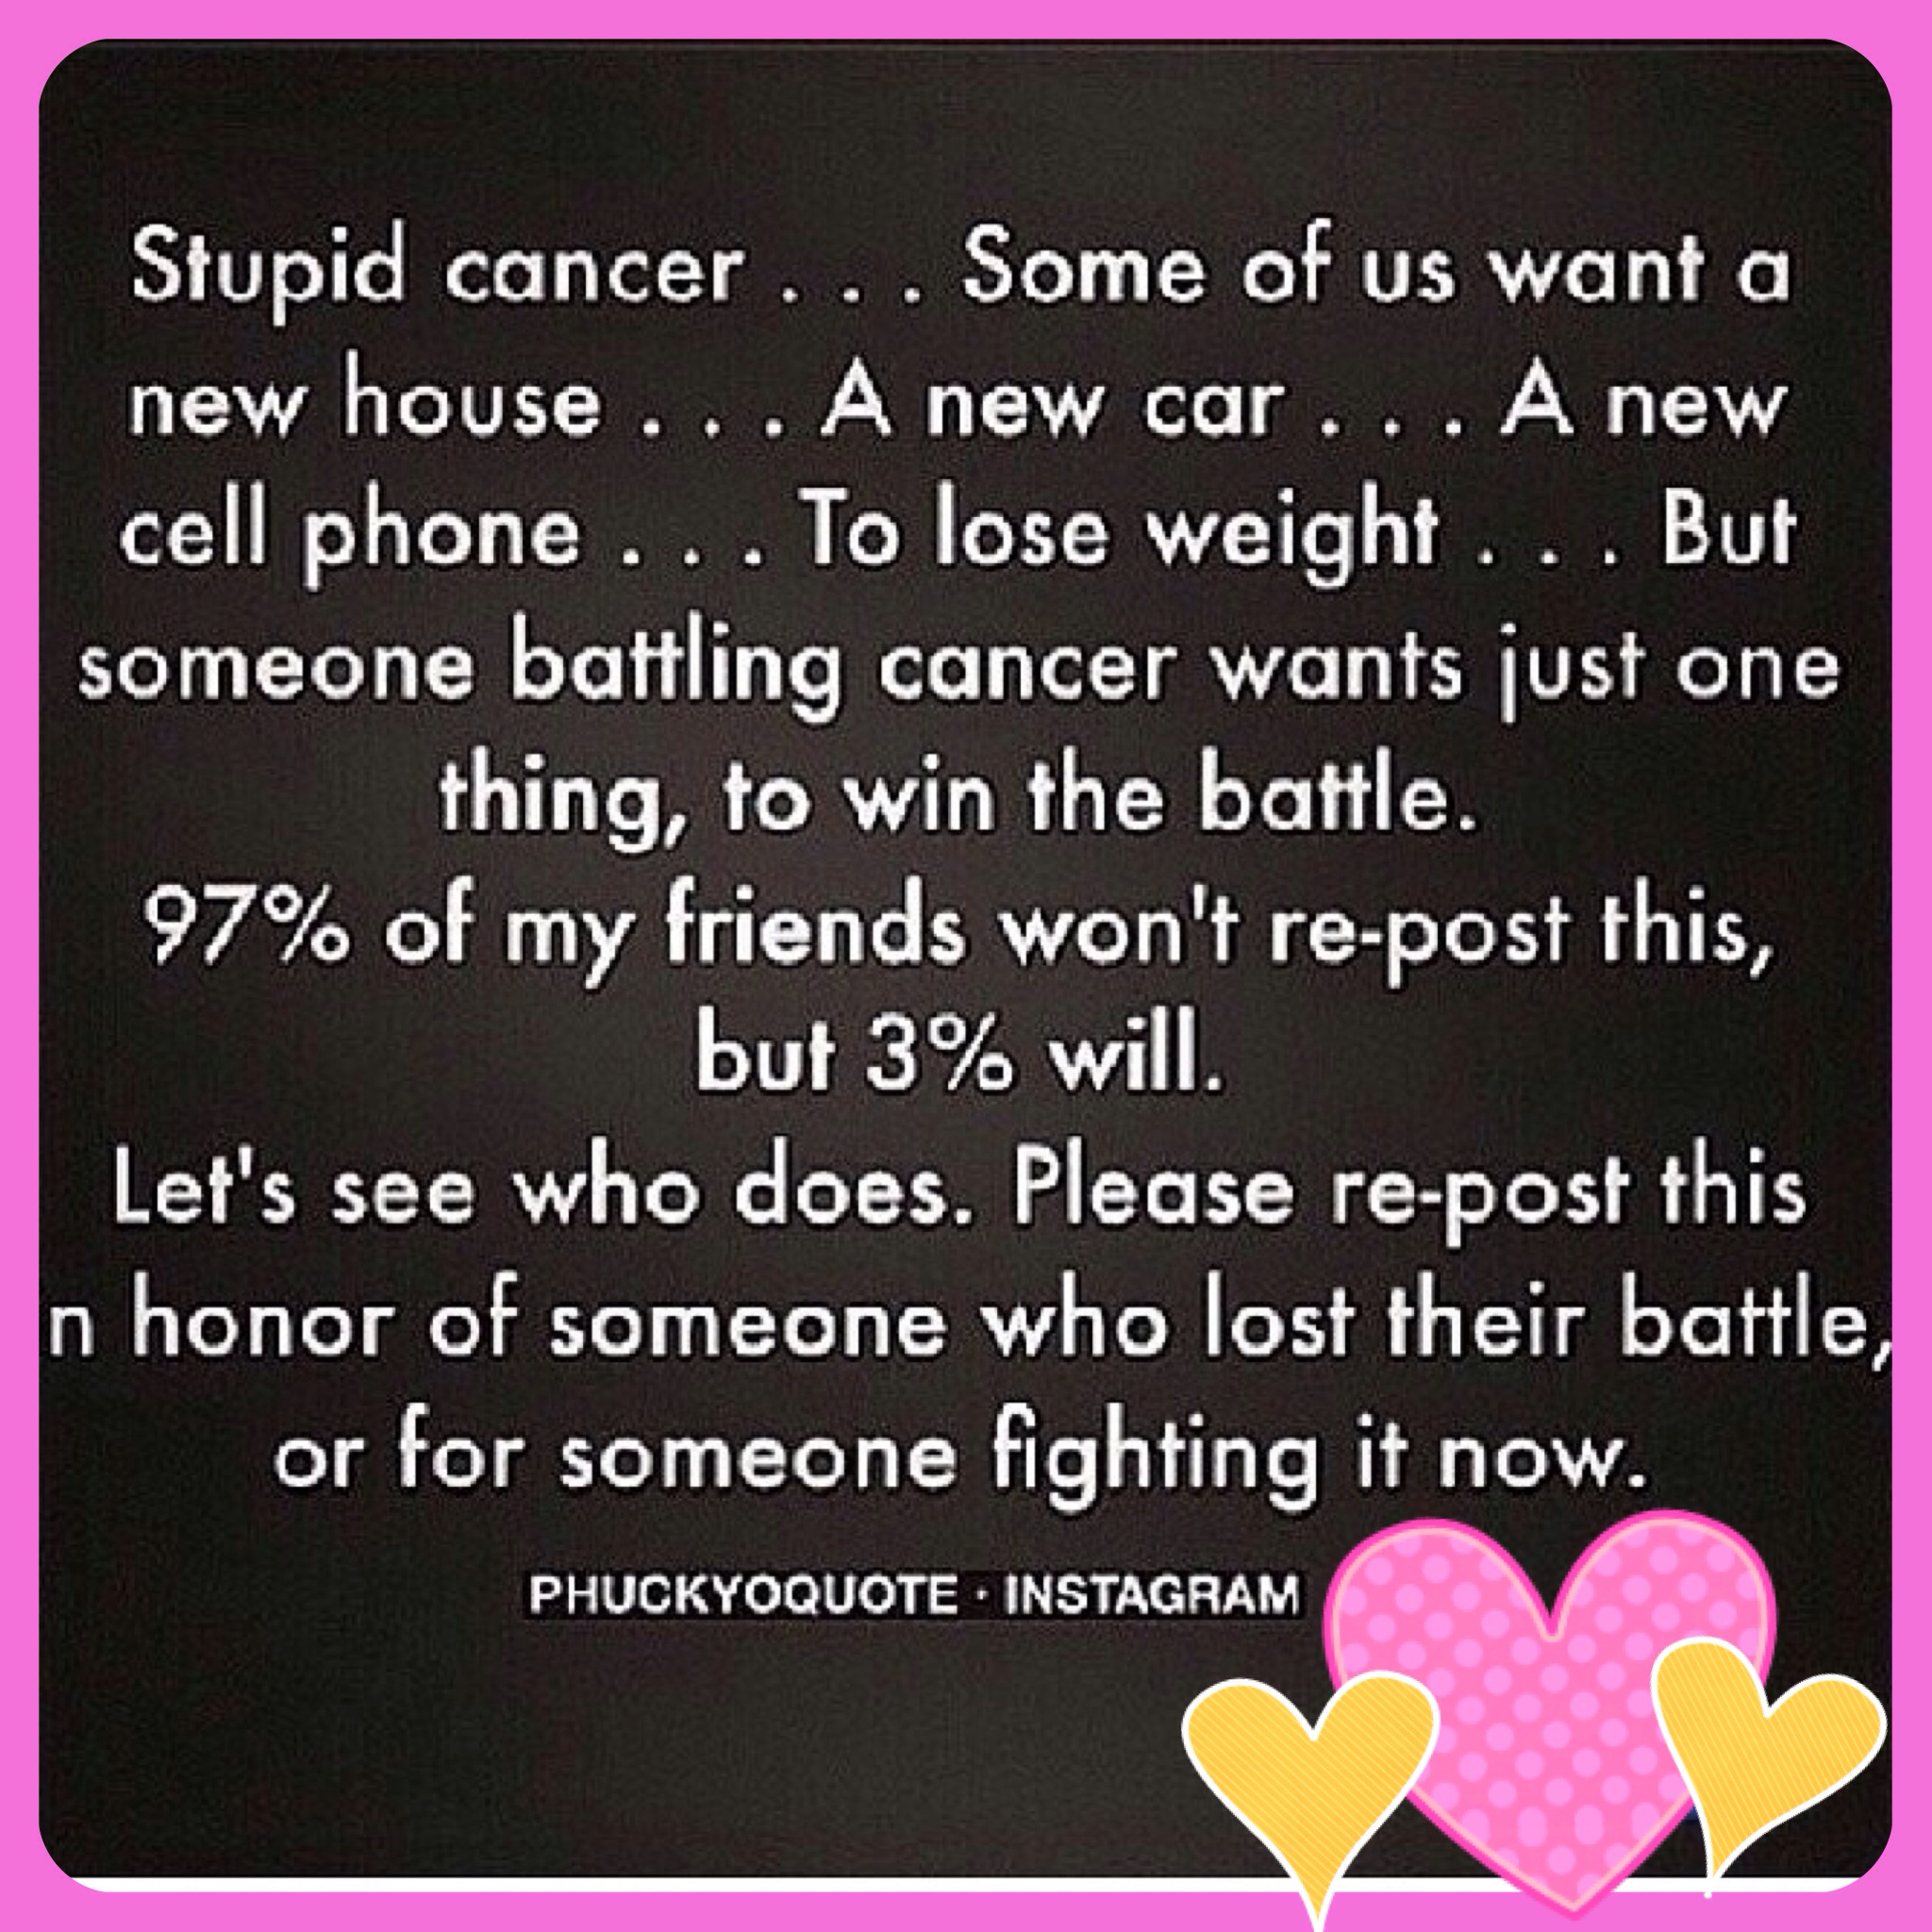 Copyright Free Inspirational Quotes Quotesgram: Beat Cancer Quotes Inspirational. QuotesGram